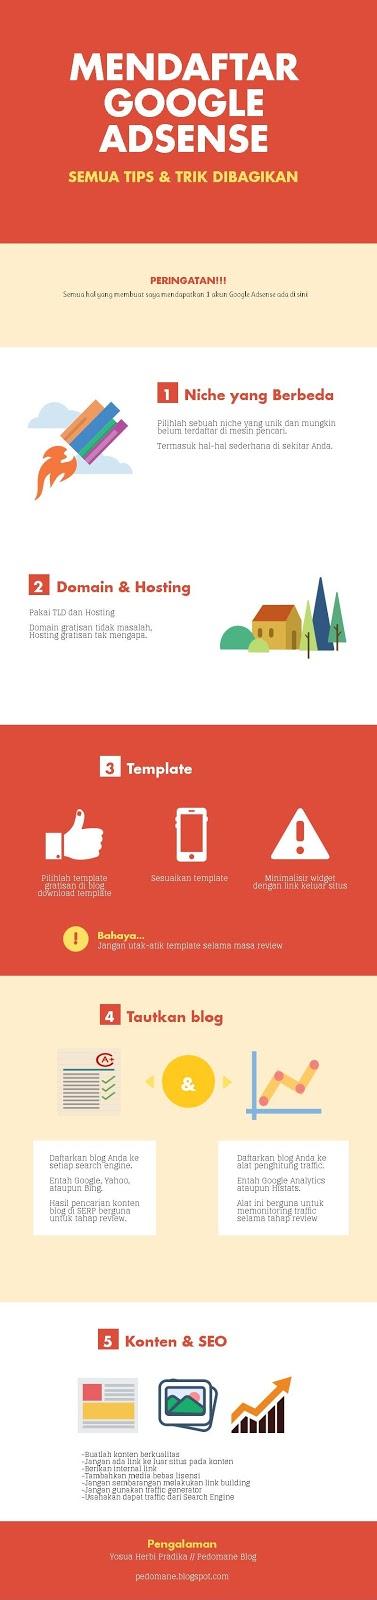 Infografis Mendaftar Google Adsense